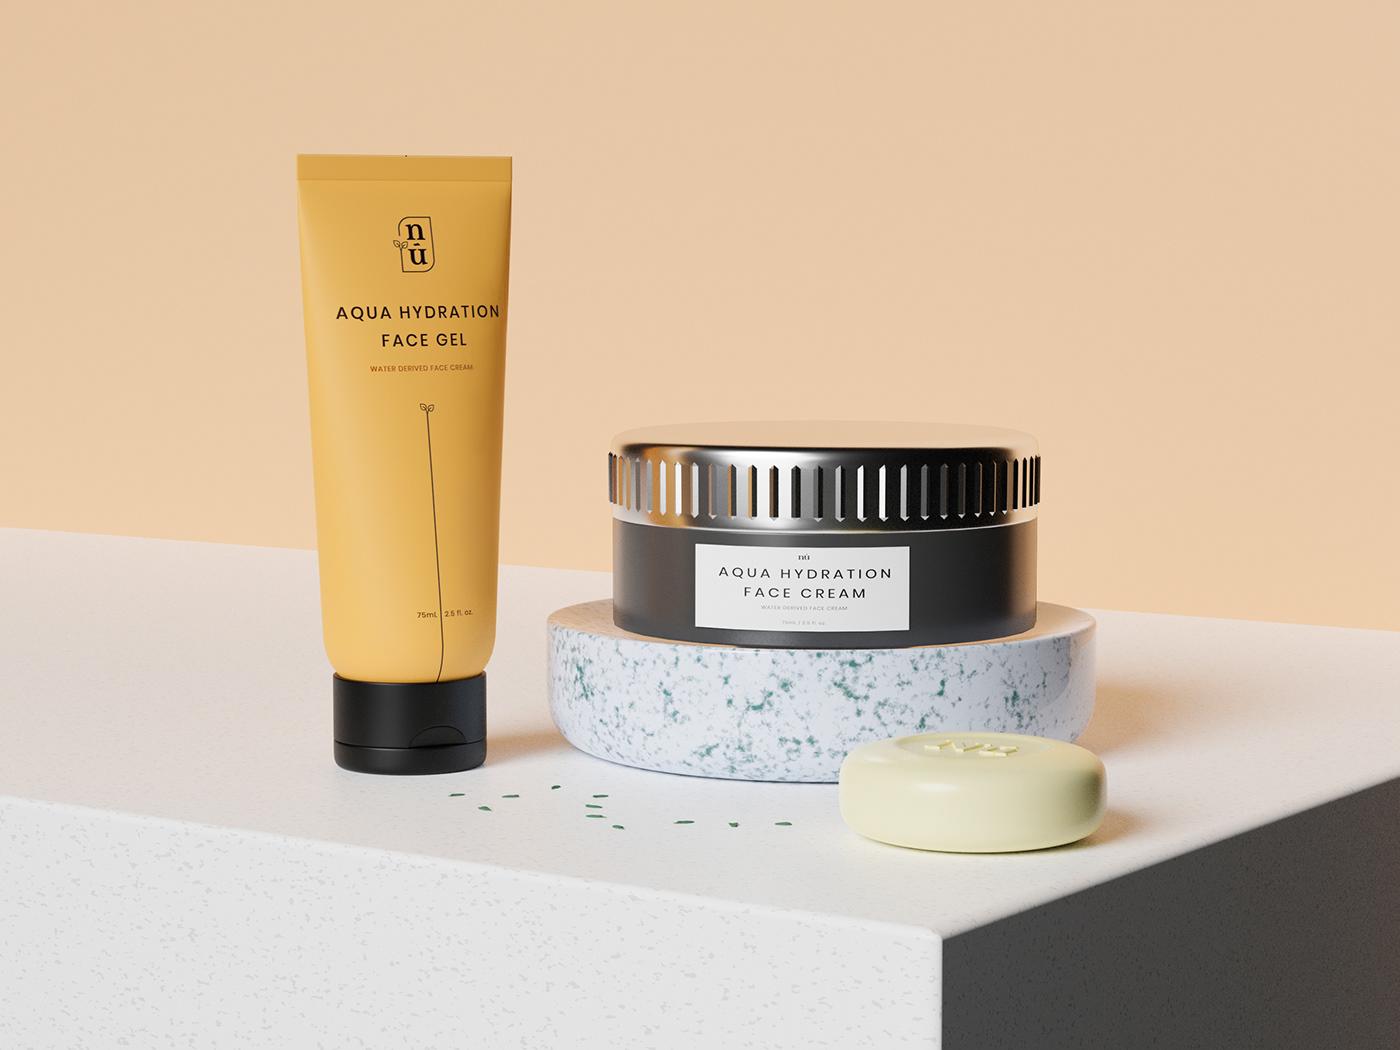 branding  clean cosmetics design makeup Minimalism naked nude Packaging skin care